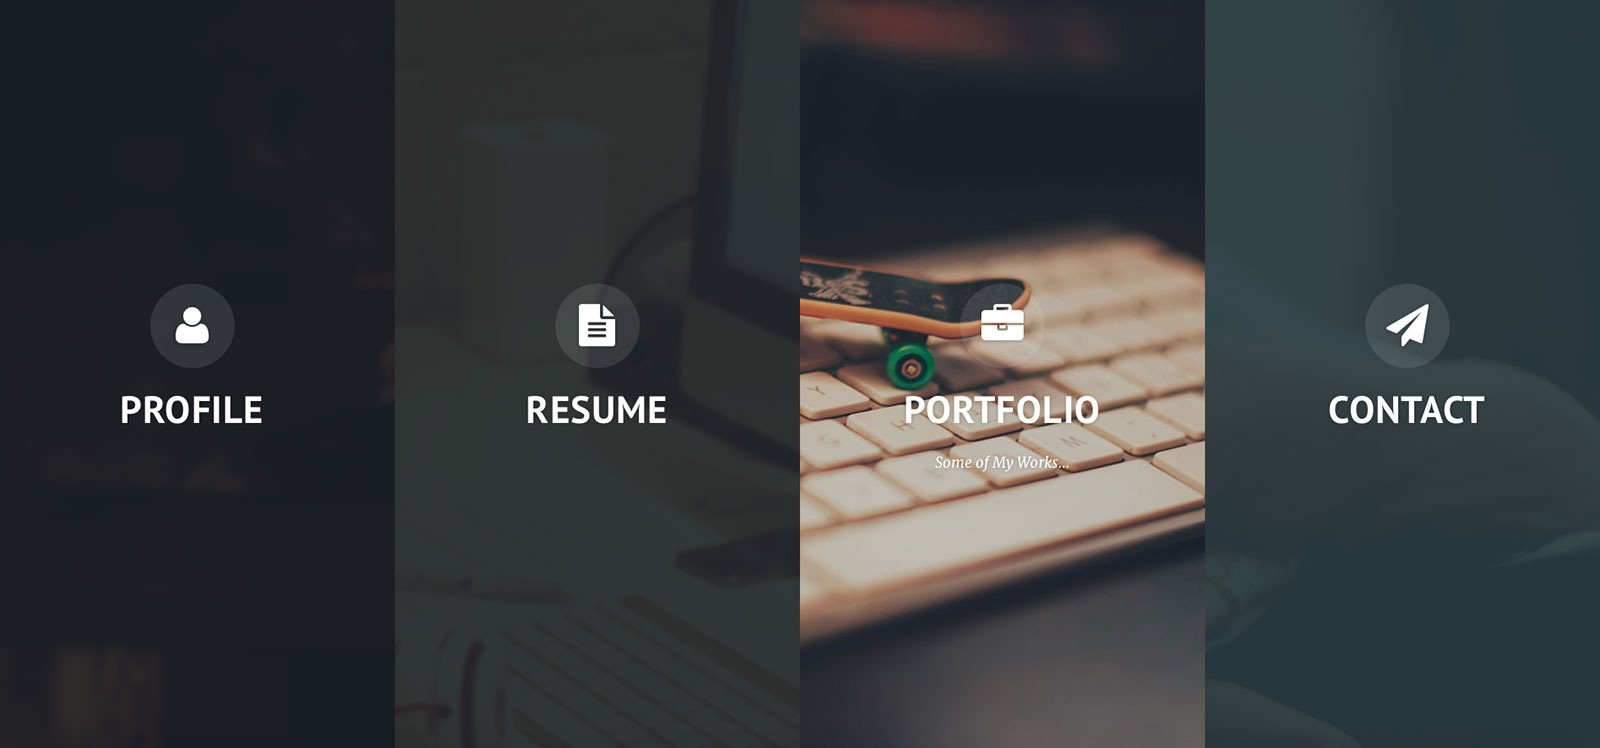 privado interactive resume portfolio template by codetic privado interactive resume portfolio template personal site templates preview preview png preview screenshot 1 jpg